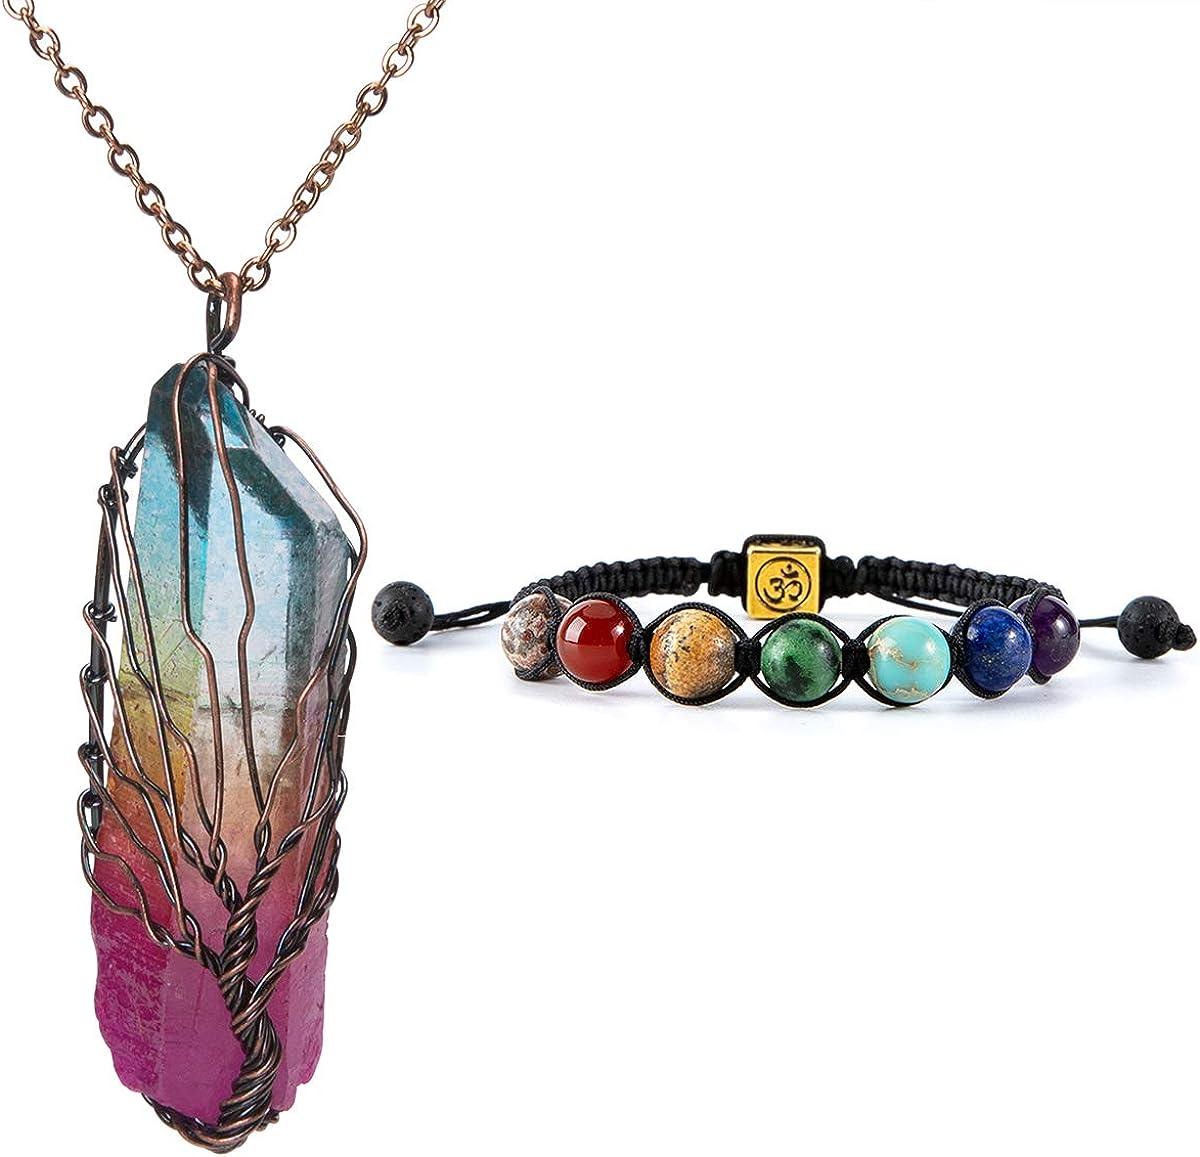 Clear Quartz Crystal Point 7 Chakra Stone Silver Pendant Necklace Reiki Healing